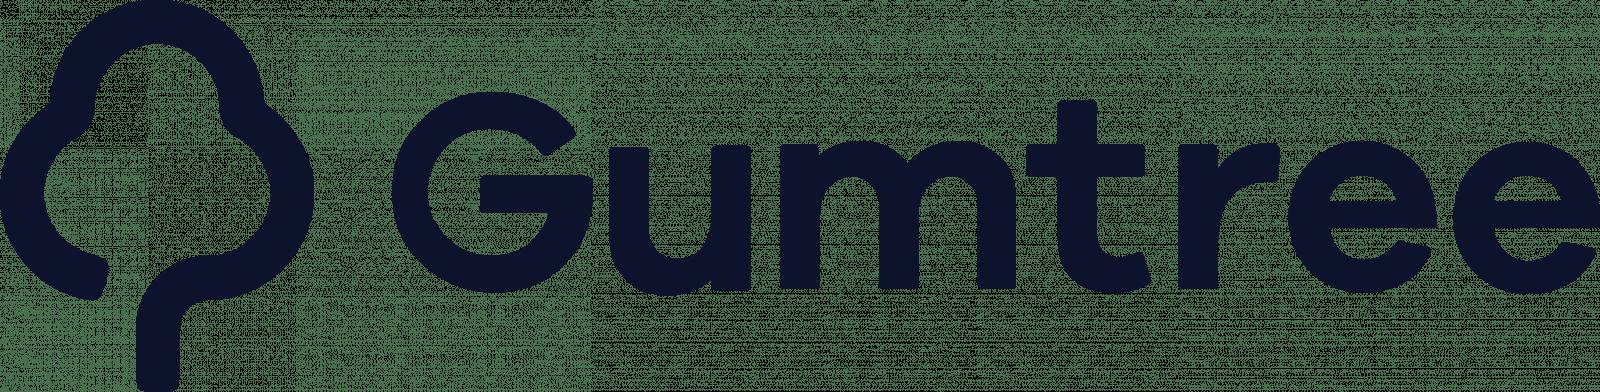 gumtree-logo-vector